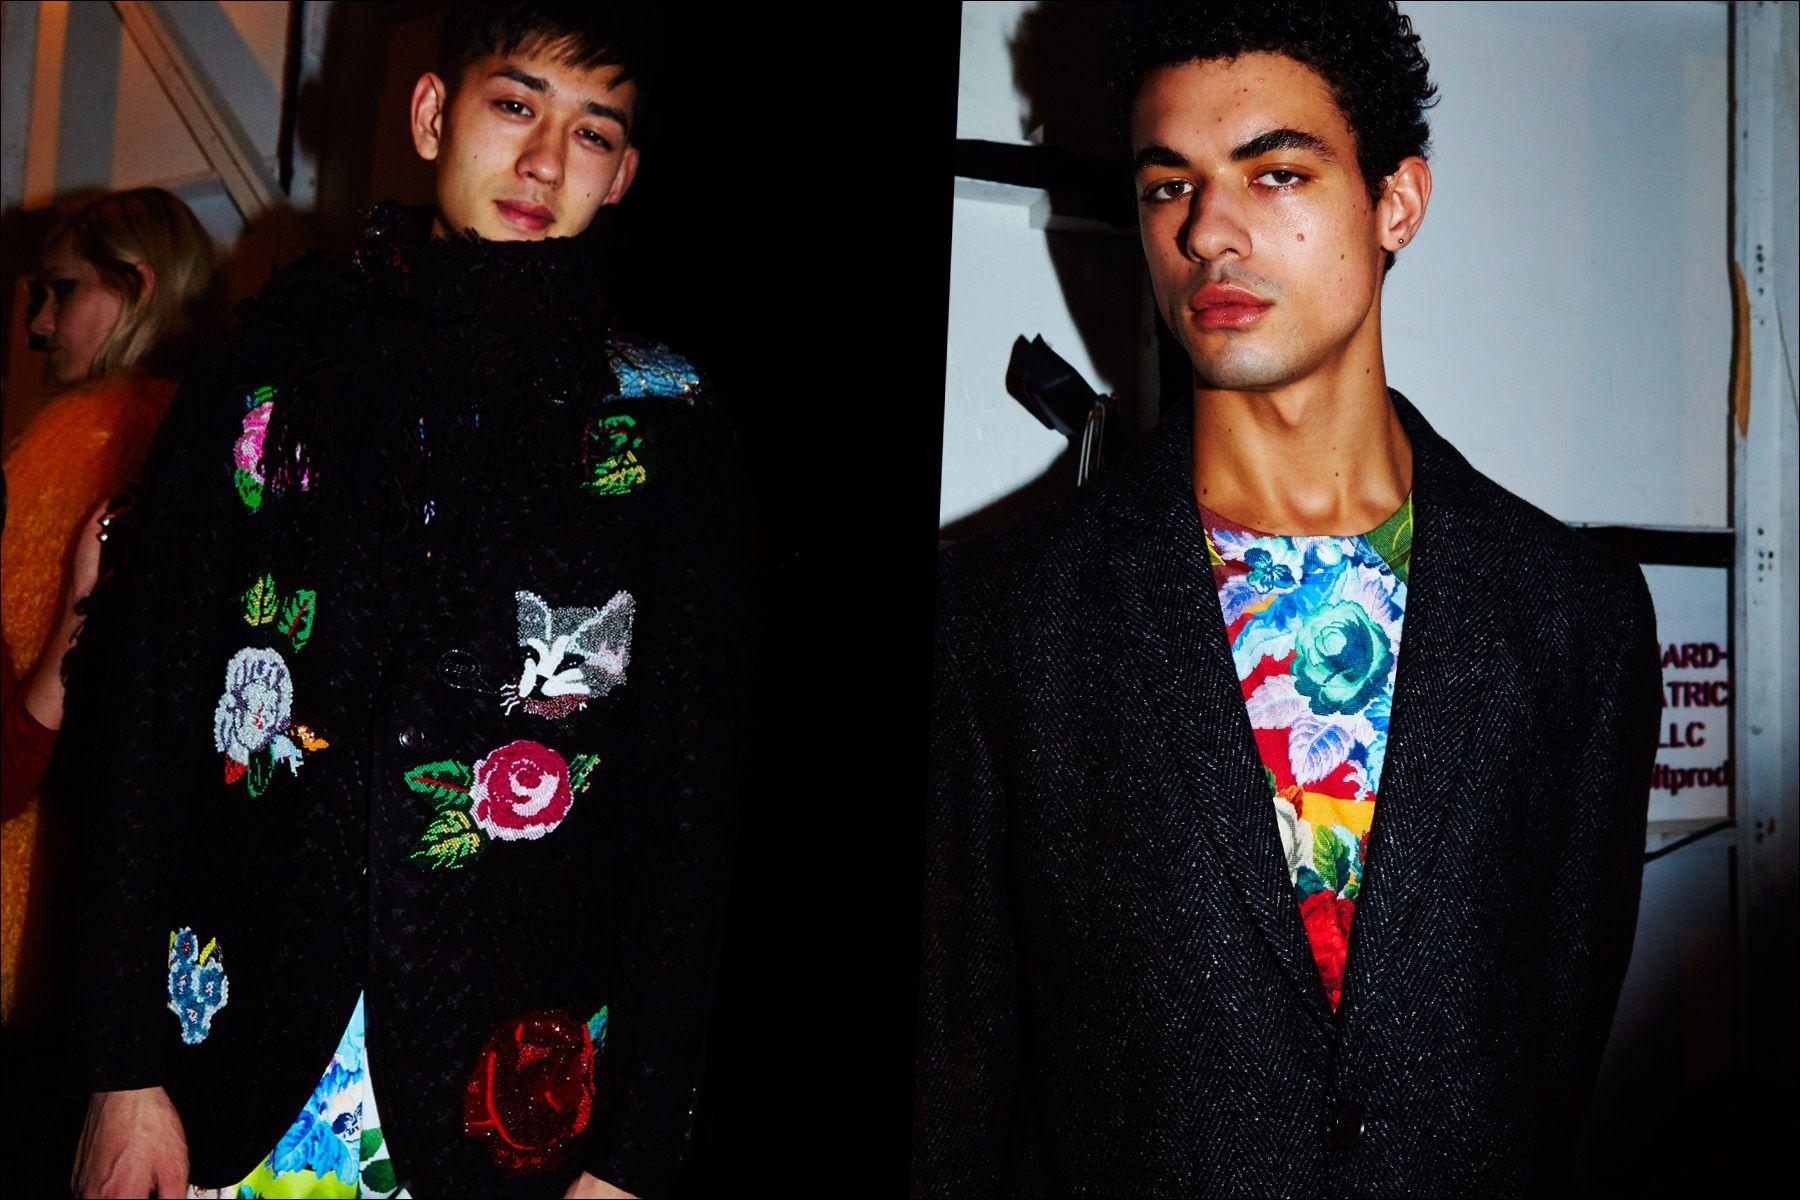 Male models Keisuke Asano & Malik Alain snapped backstage at Libertine Fall/Winter 2017 collection. Photography by Alexander Thompson for Ponyboy magazine New York.